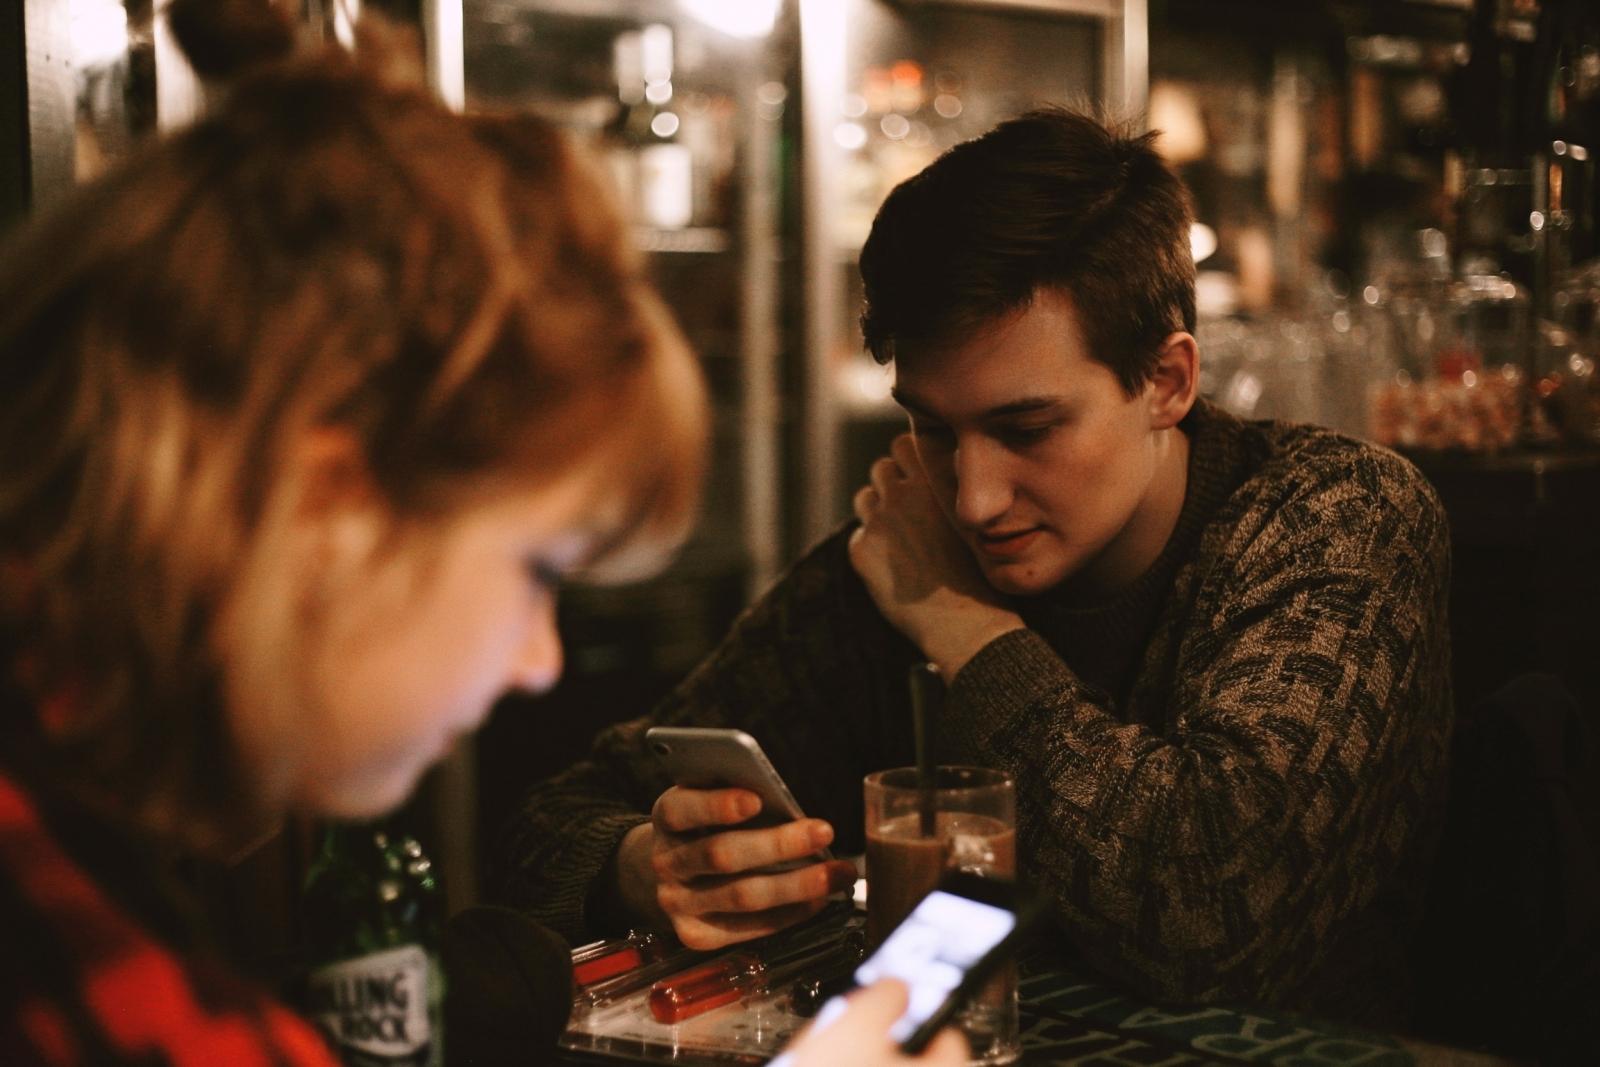 Media and smartphone use